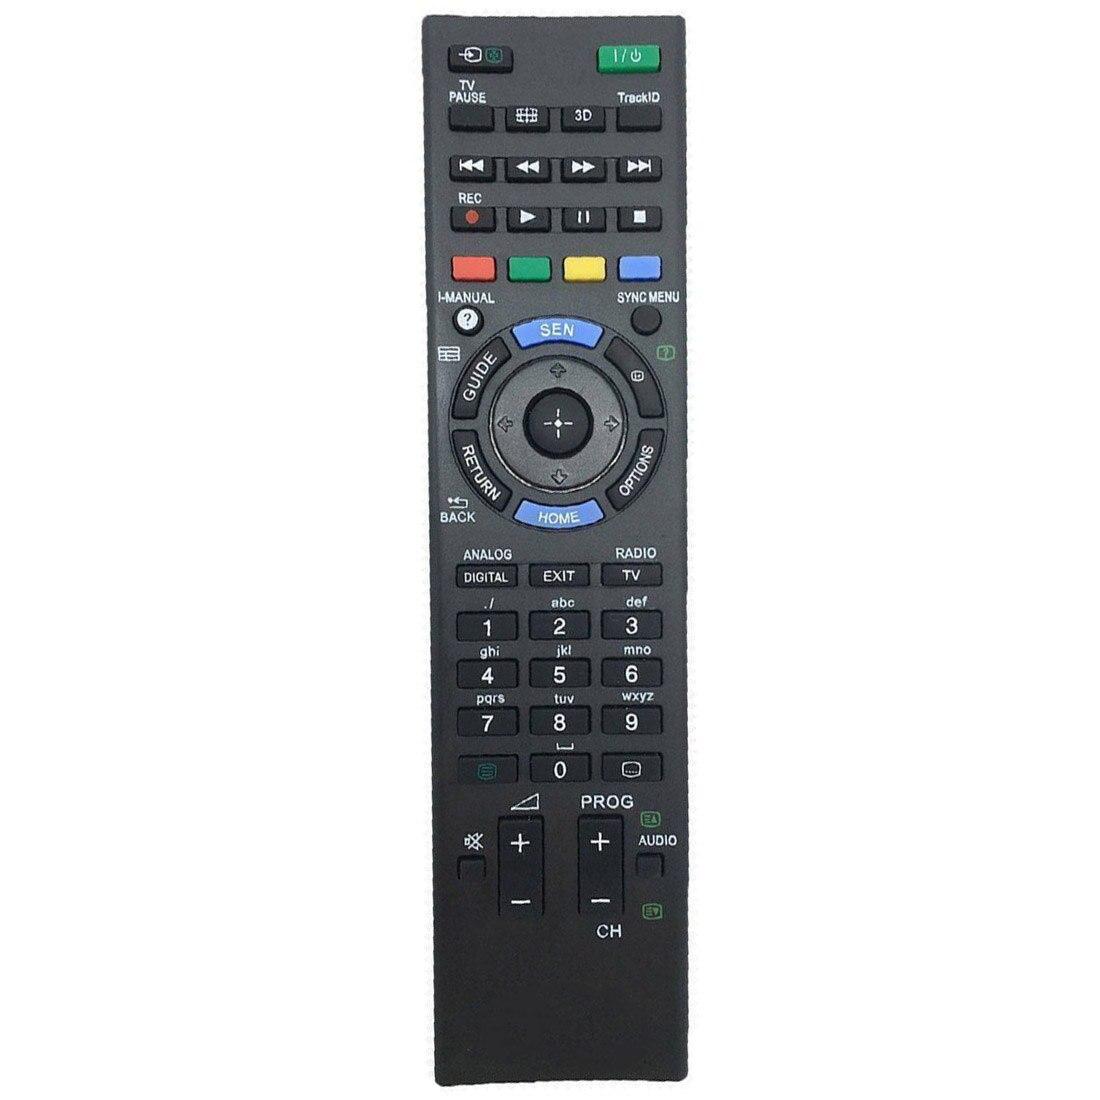 Wholesale5pcs*New Remote Control RM-ED047 For SONY Bravia TV KDL-40HX750 KDL-46HX850 док станция sony dk28 tv dock